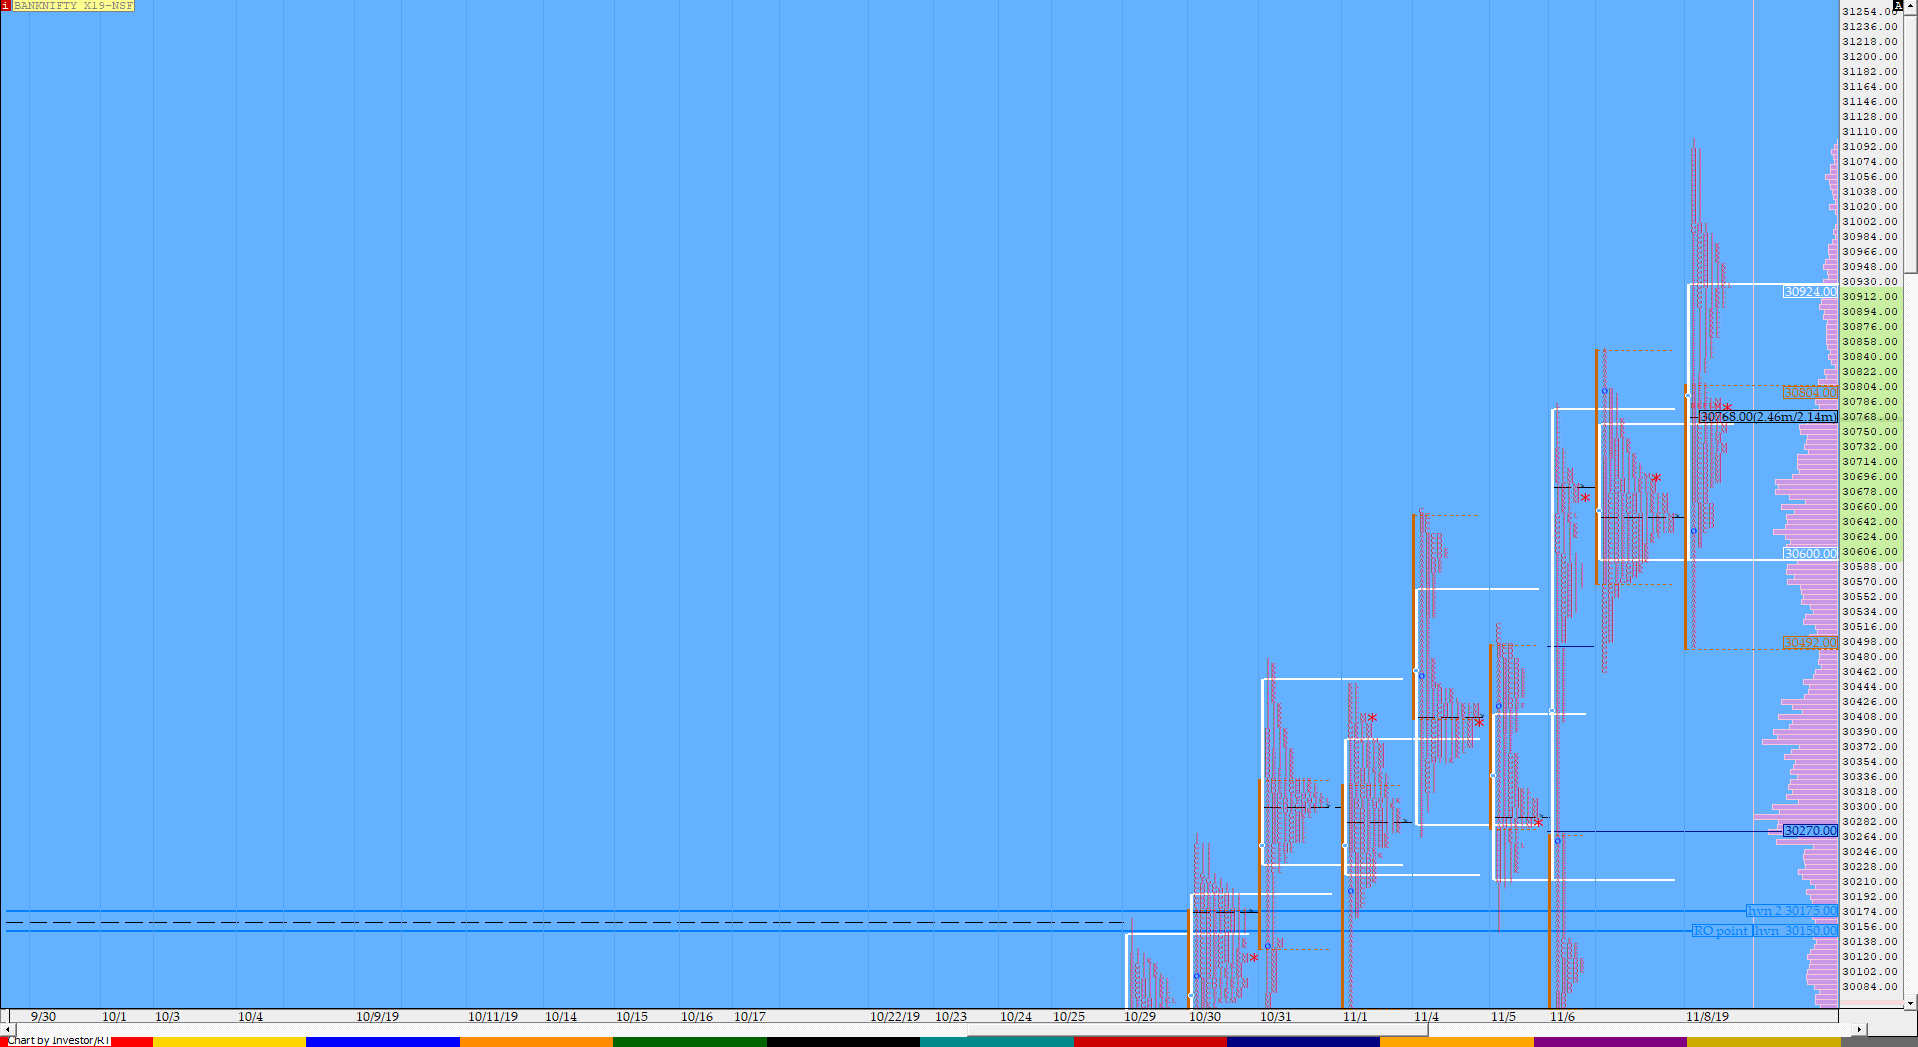 Market Profile Analysis dated 8th November 3